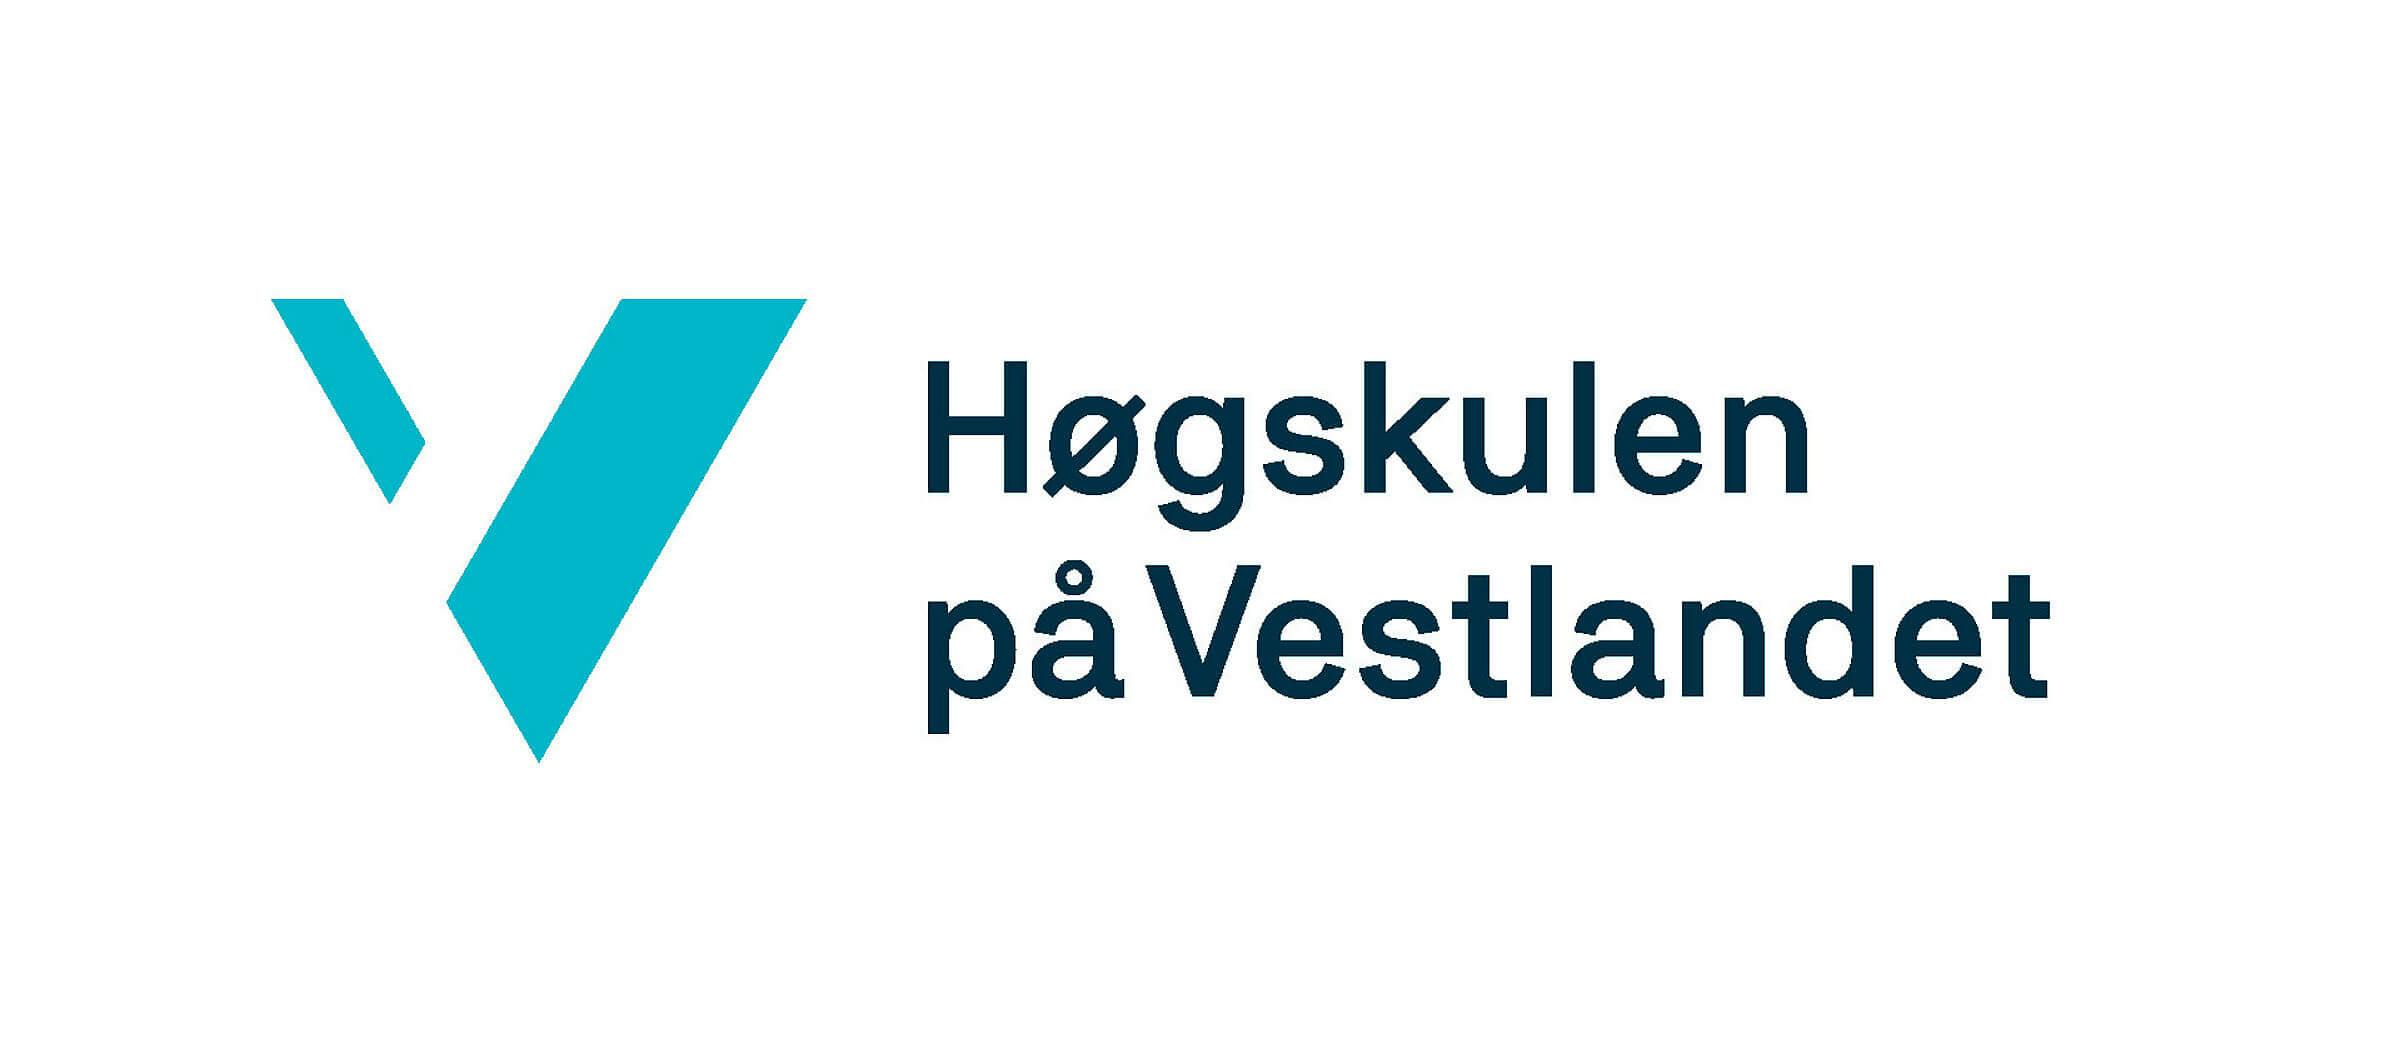 Høgskulen Vestlandet Logo